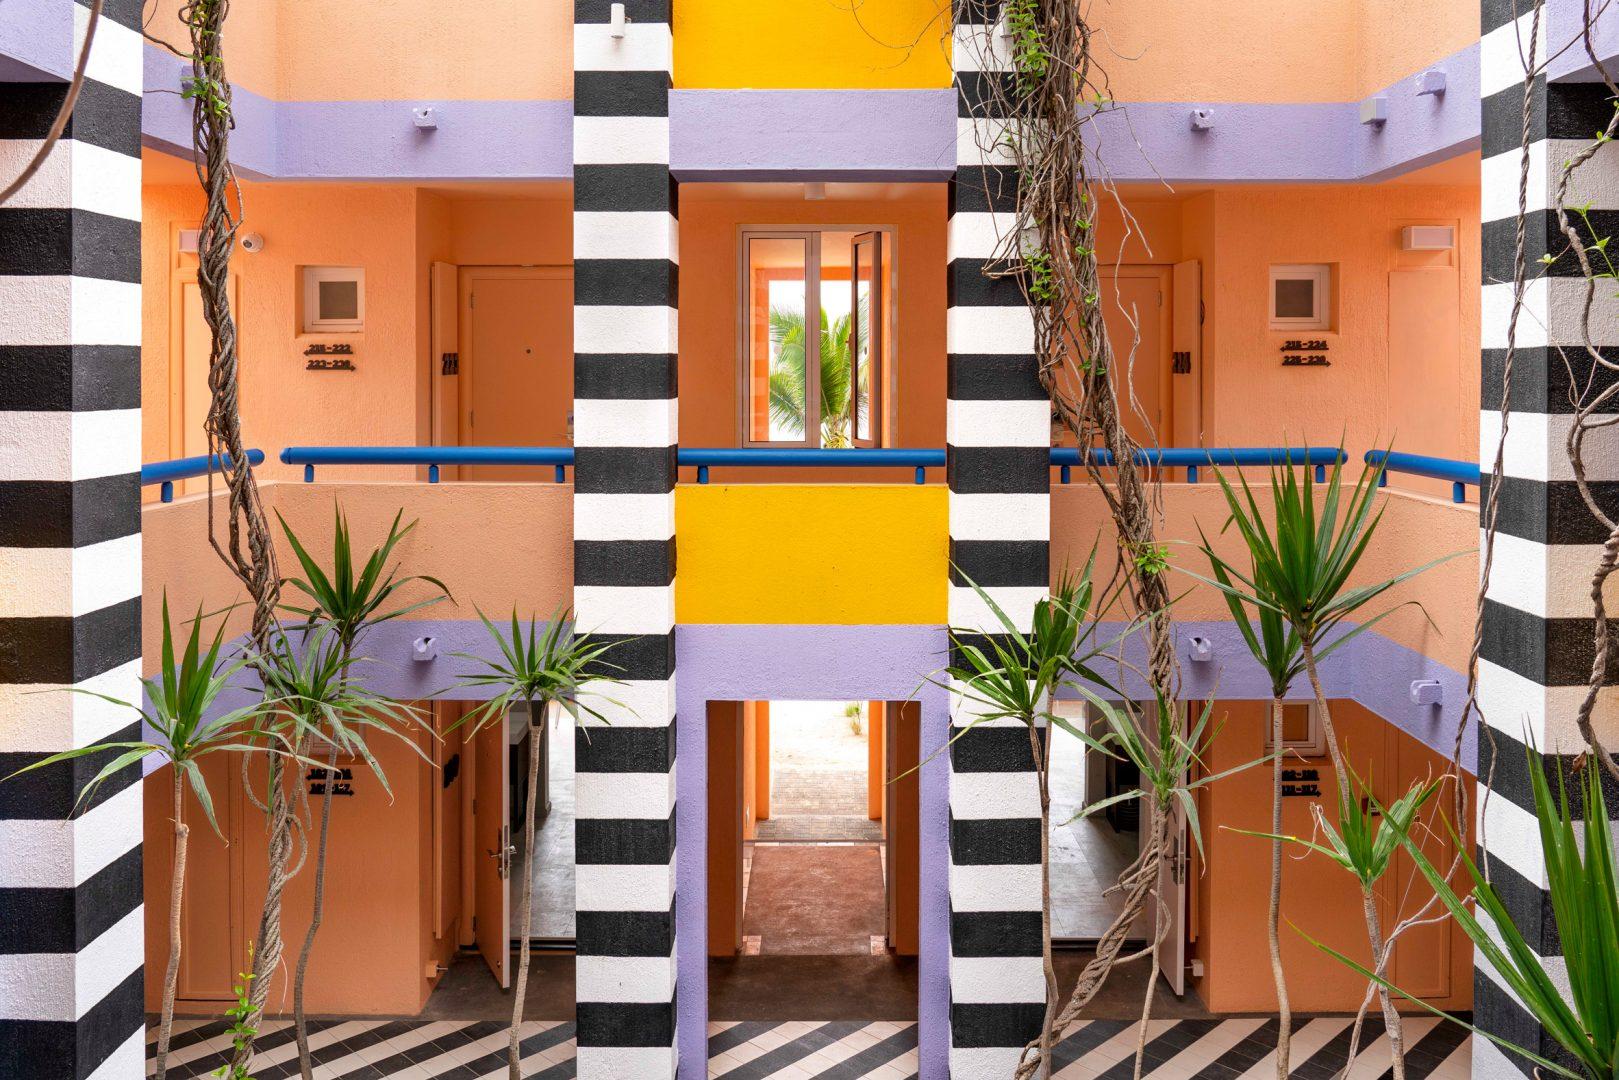 Daring geometries in Mauritius by Camille Walala